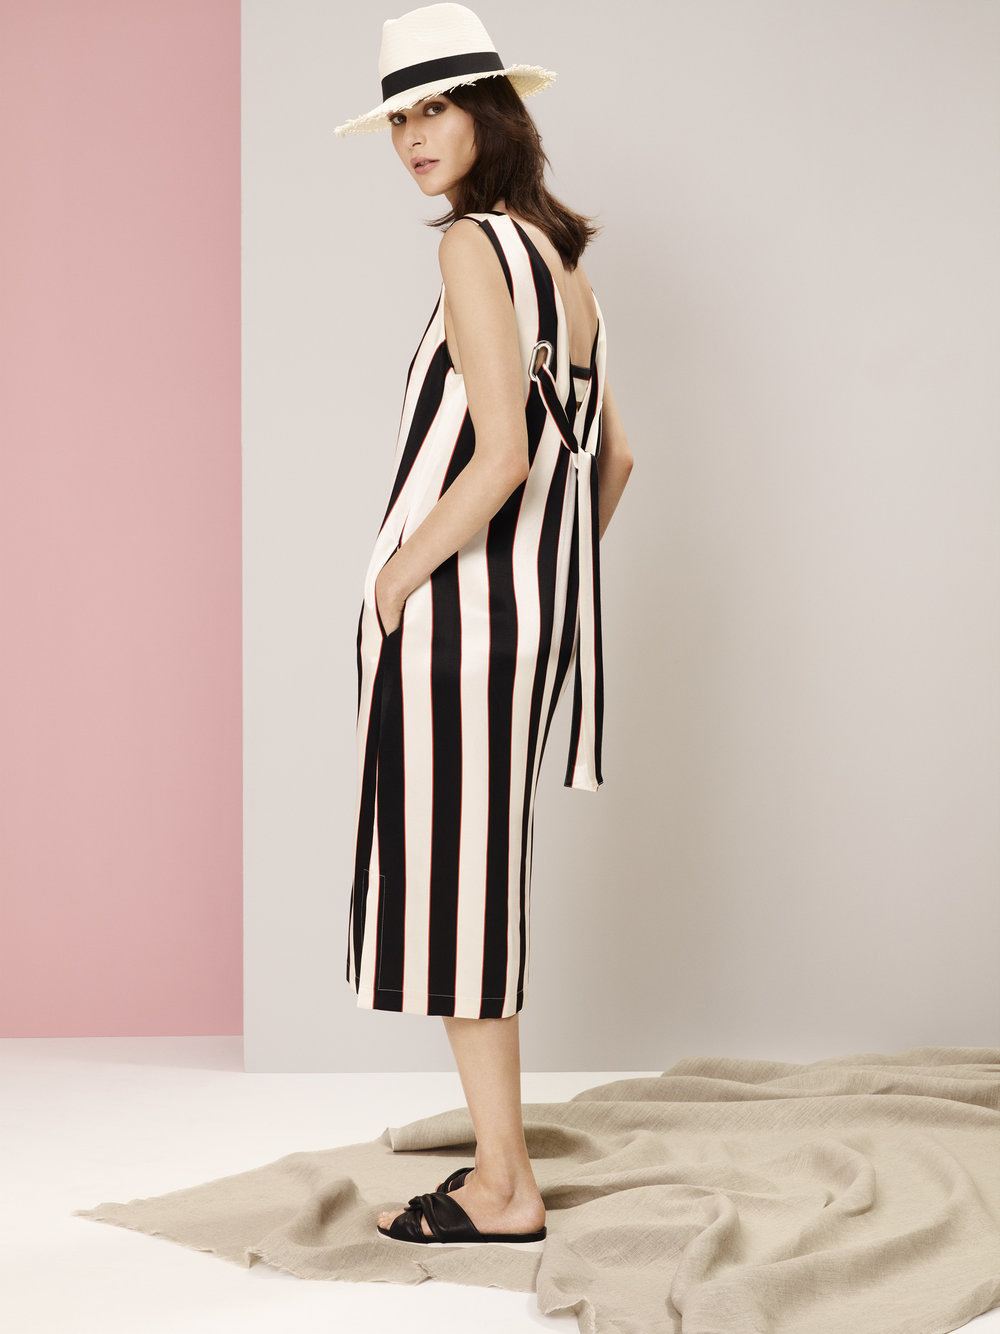 ms-nudeAUTOGRAPH+DRESS+£59,+M&S+COLLECTION+HAT+£19.50,+M&S+COLLECTION+SHOE+£35.jpg